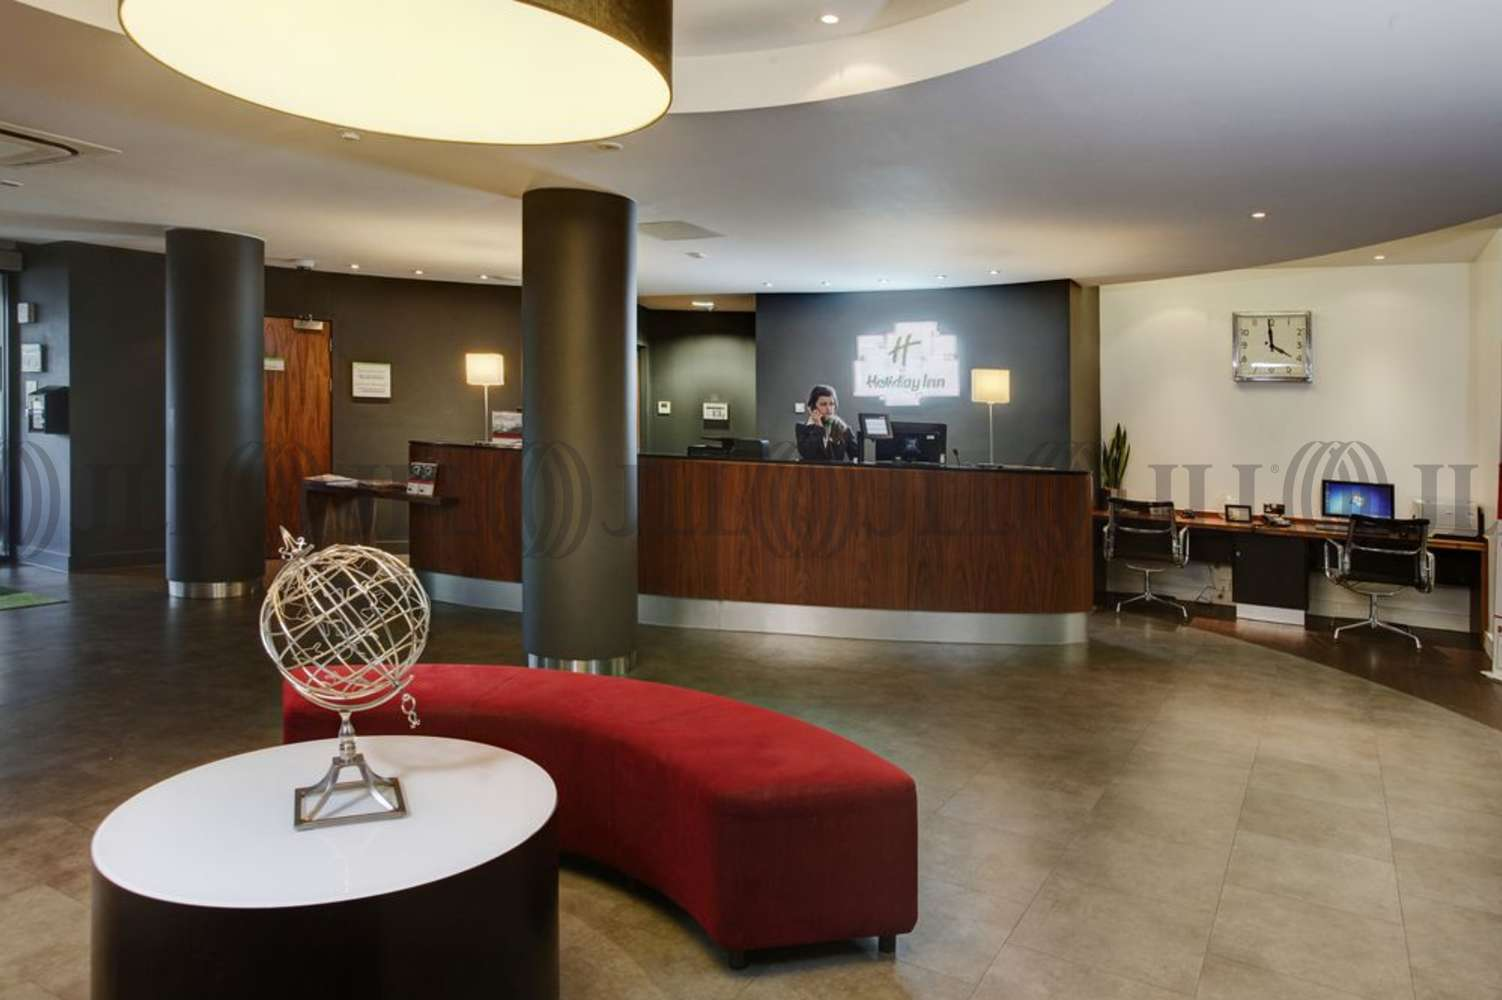 Hotel Luton, LU2 9LF - Holiday Inn London Luton Airport